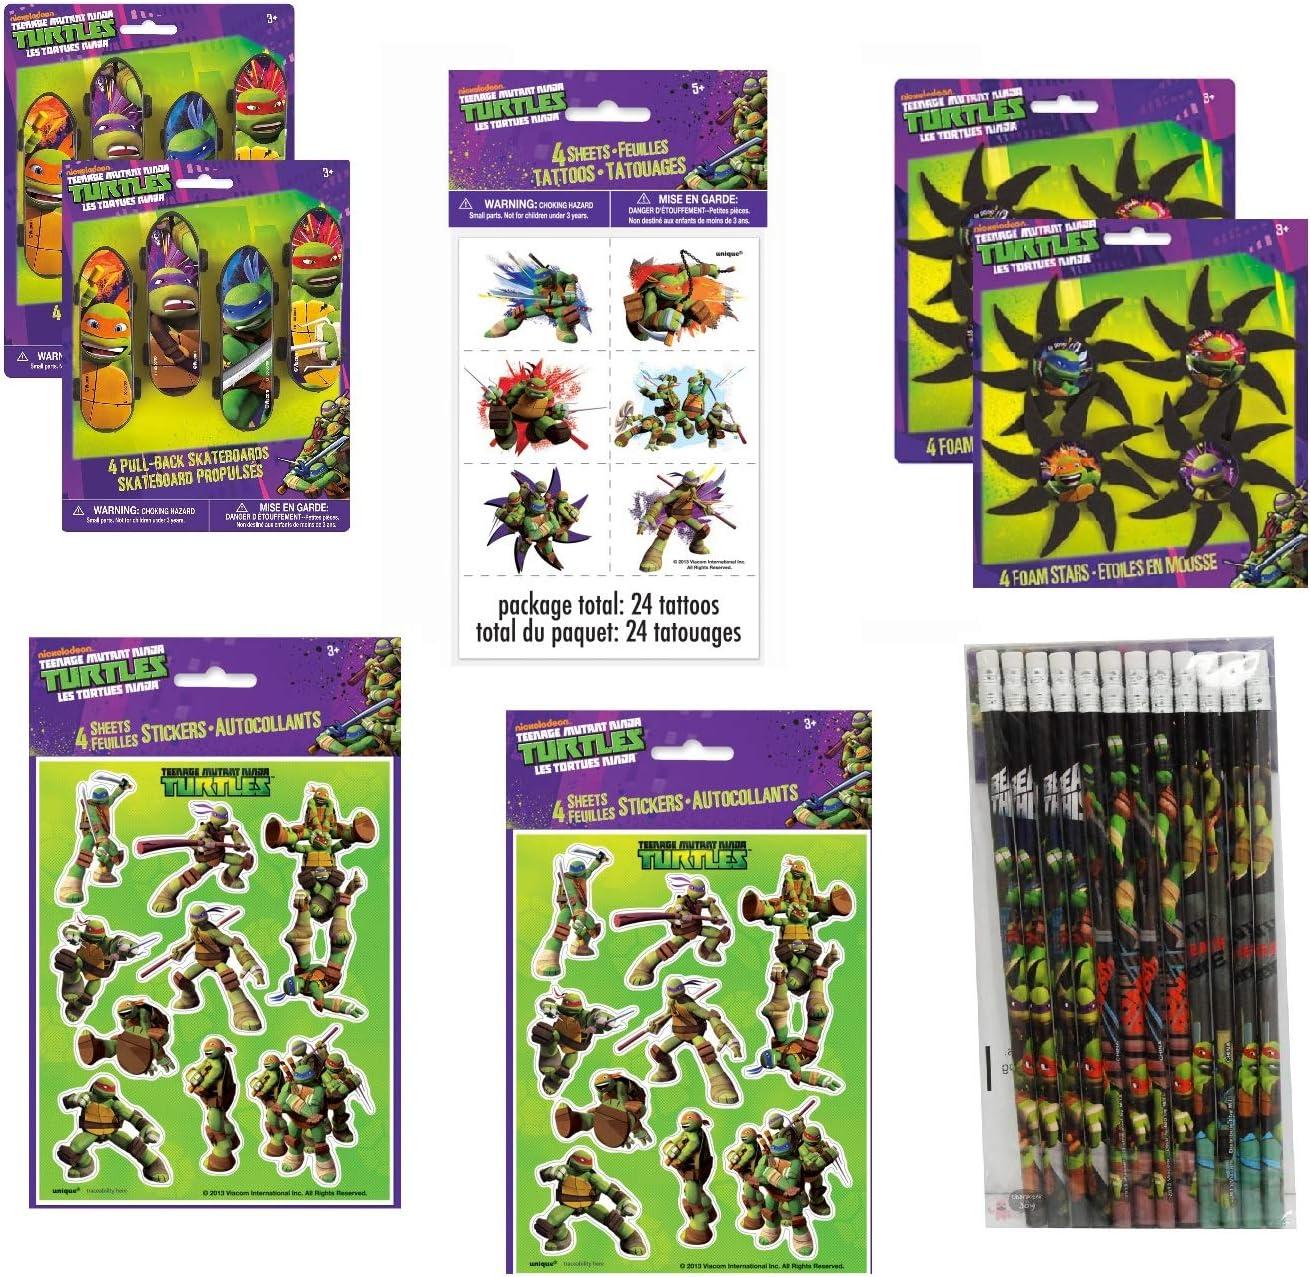 Teenage Mutant Ninja Turtles Birthday Party Favor Bundle Set includes Skateboard, Foam Stars, Pencils, Tattoos, Stickers